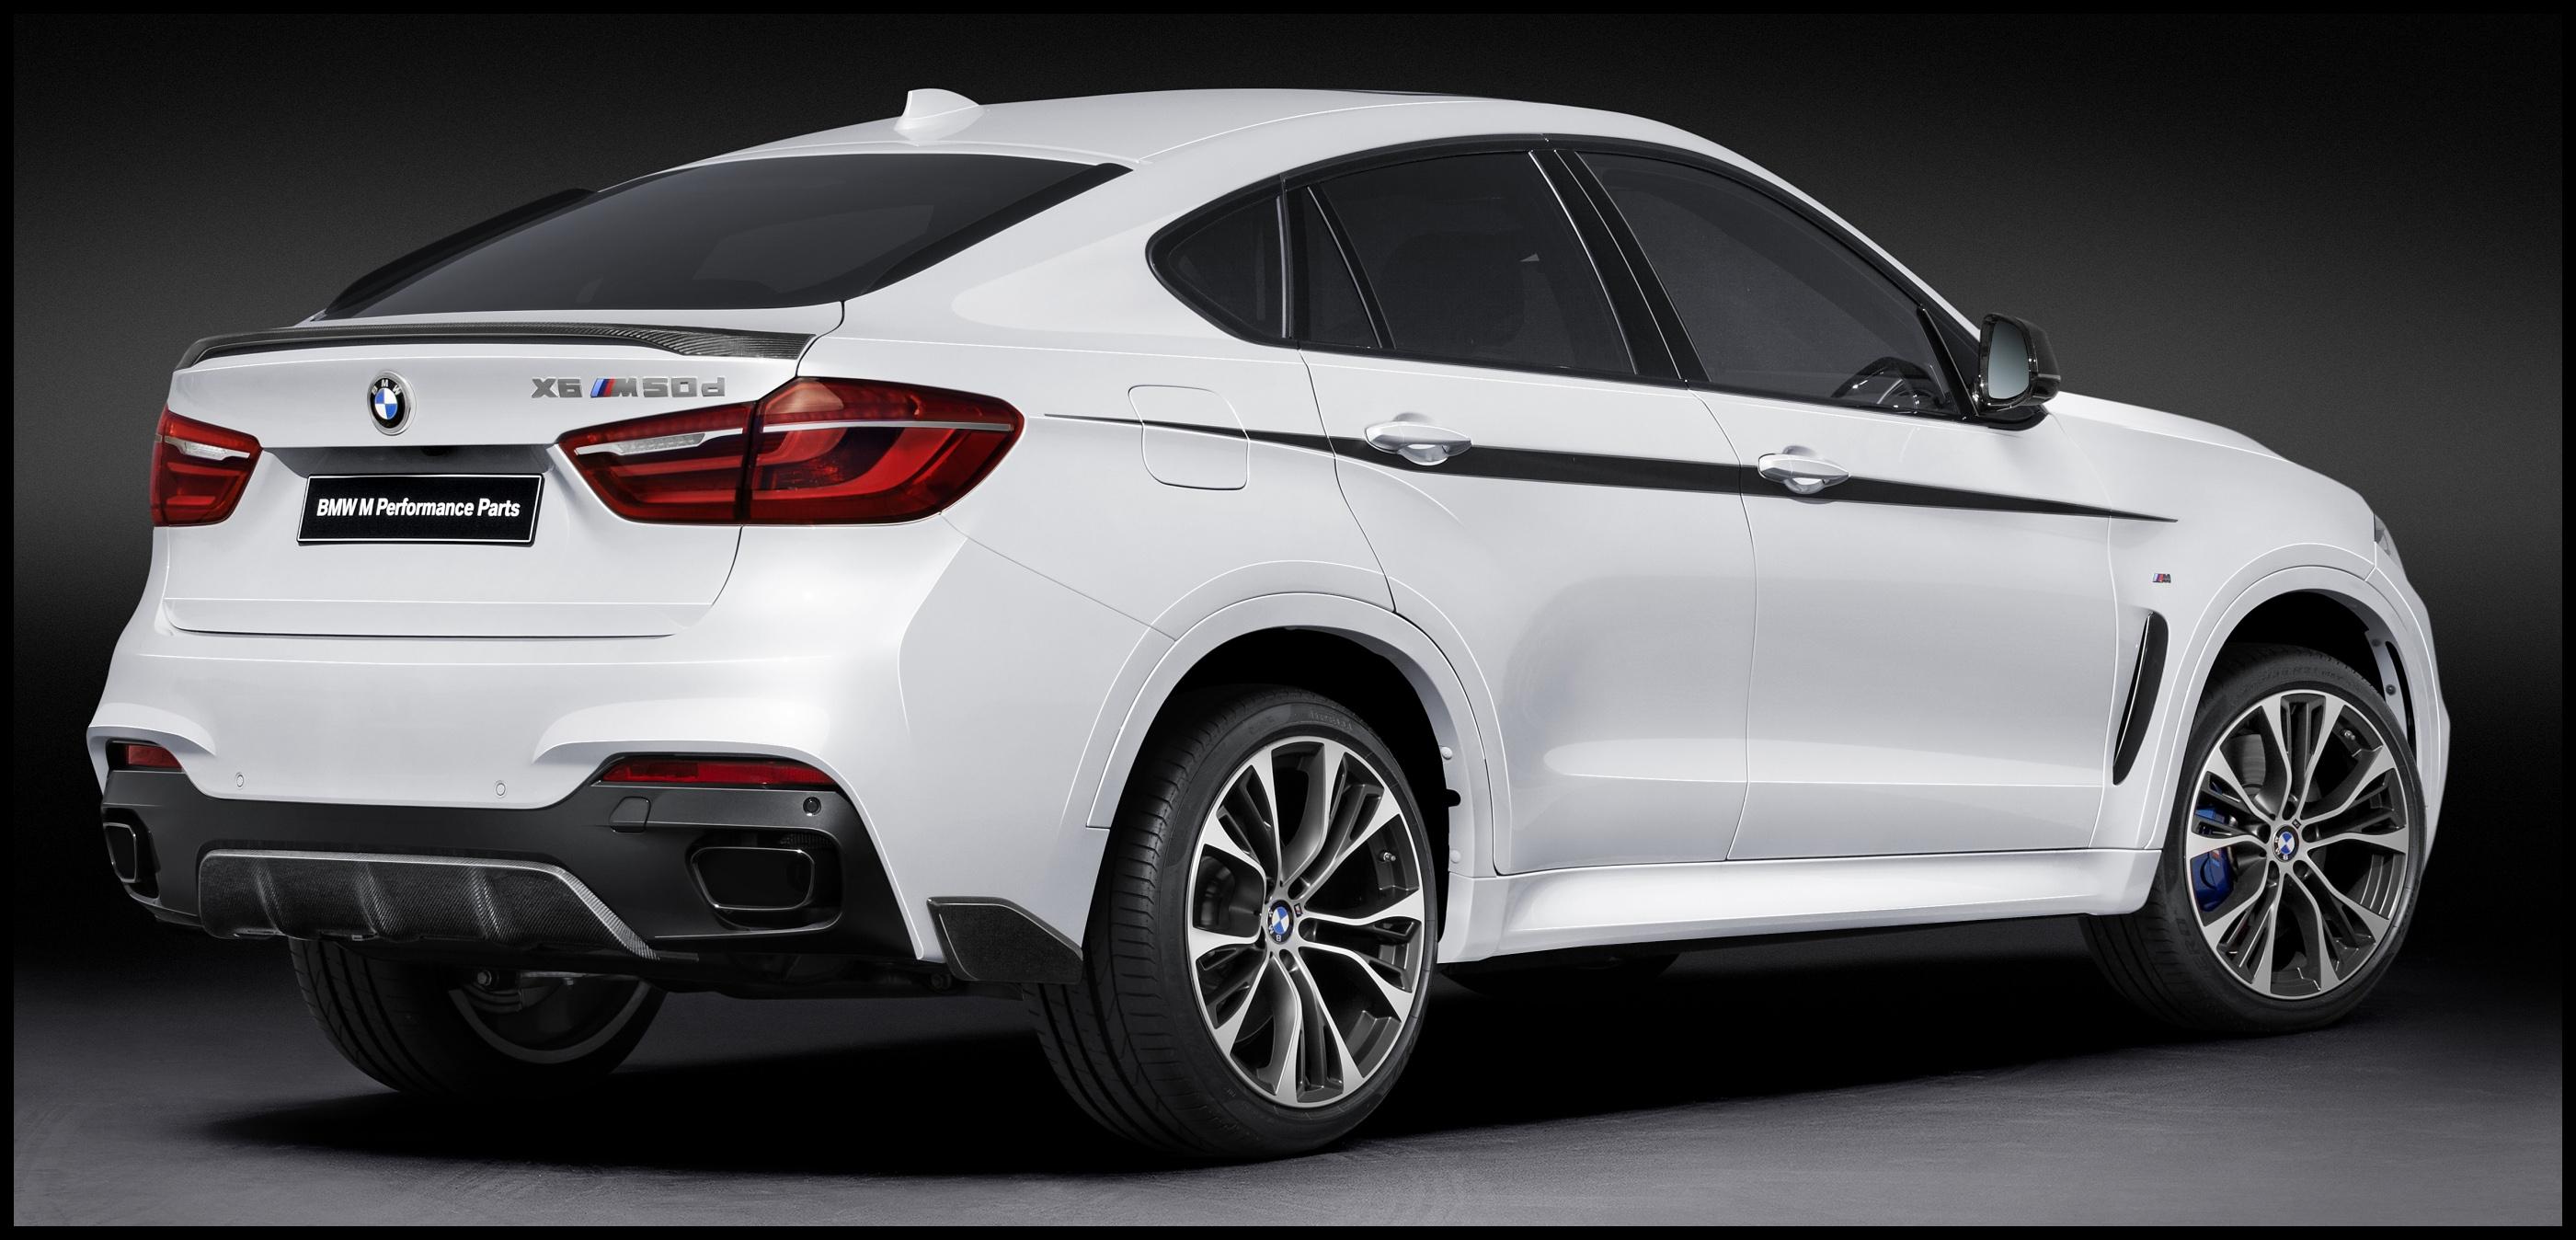 BMW X6 F16 2014 2016 PERFORMANCE AERO PACK UPGRADE BODY KIT UPGRADE BODY STYLING